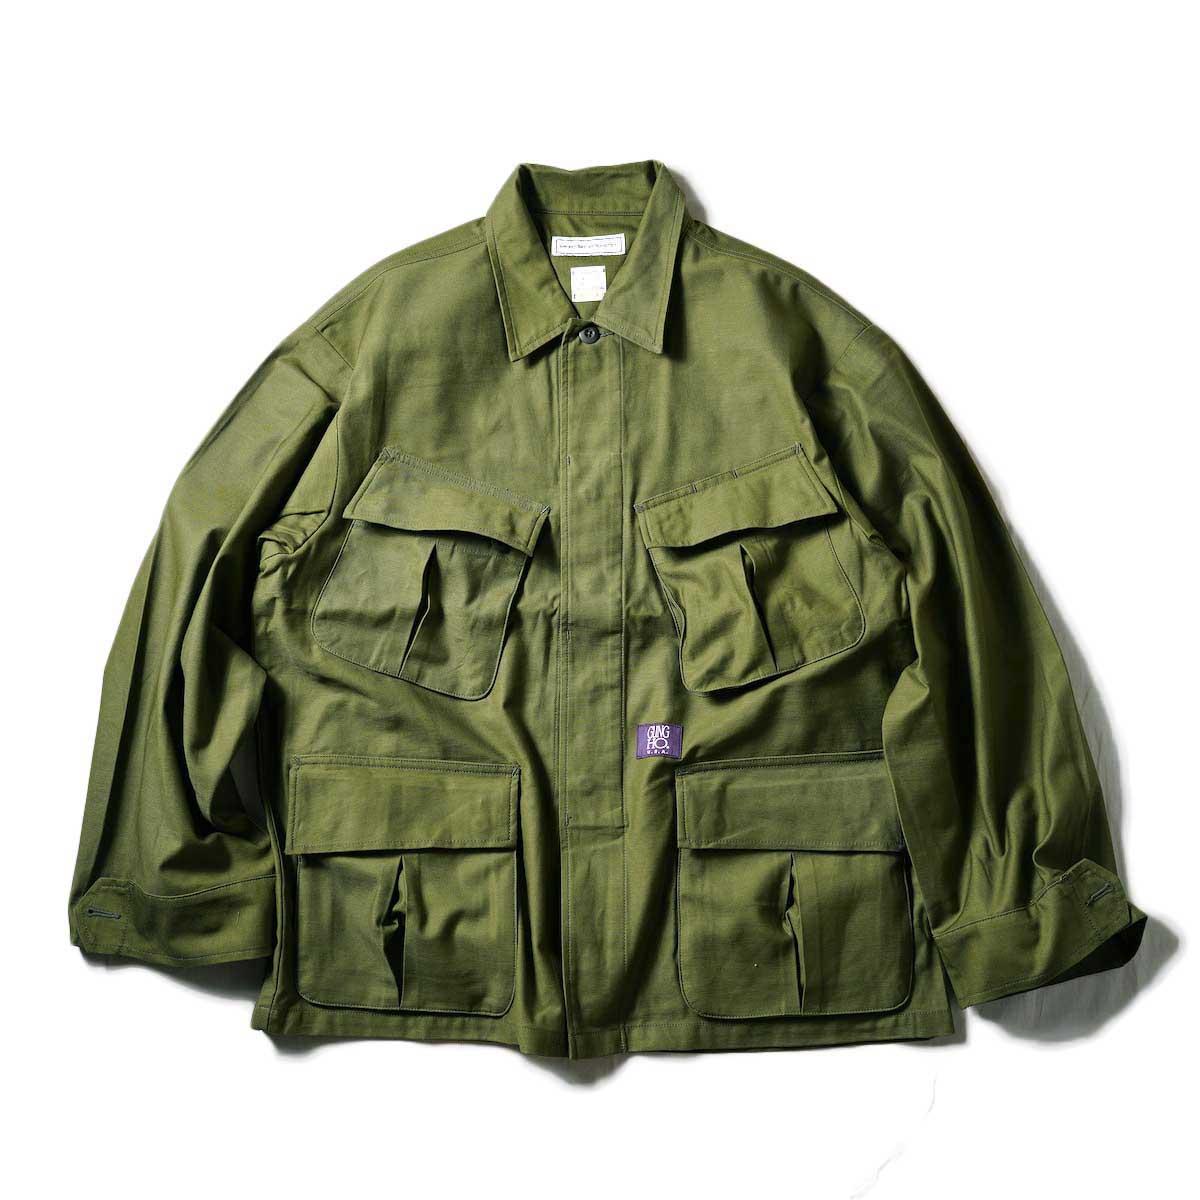 UNIVERSAL PRODUCTS / Gung Ho Fatigue Jacket (Olive)